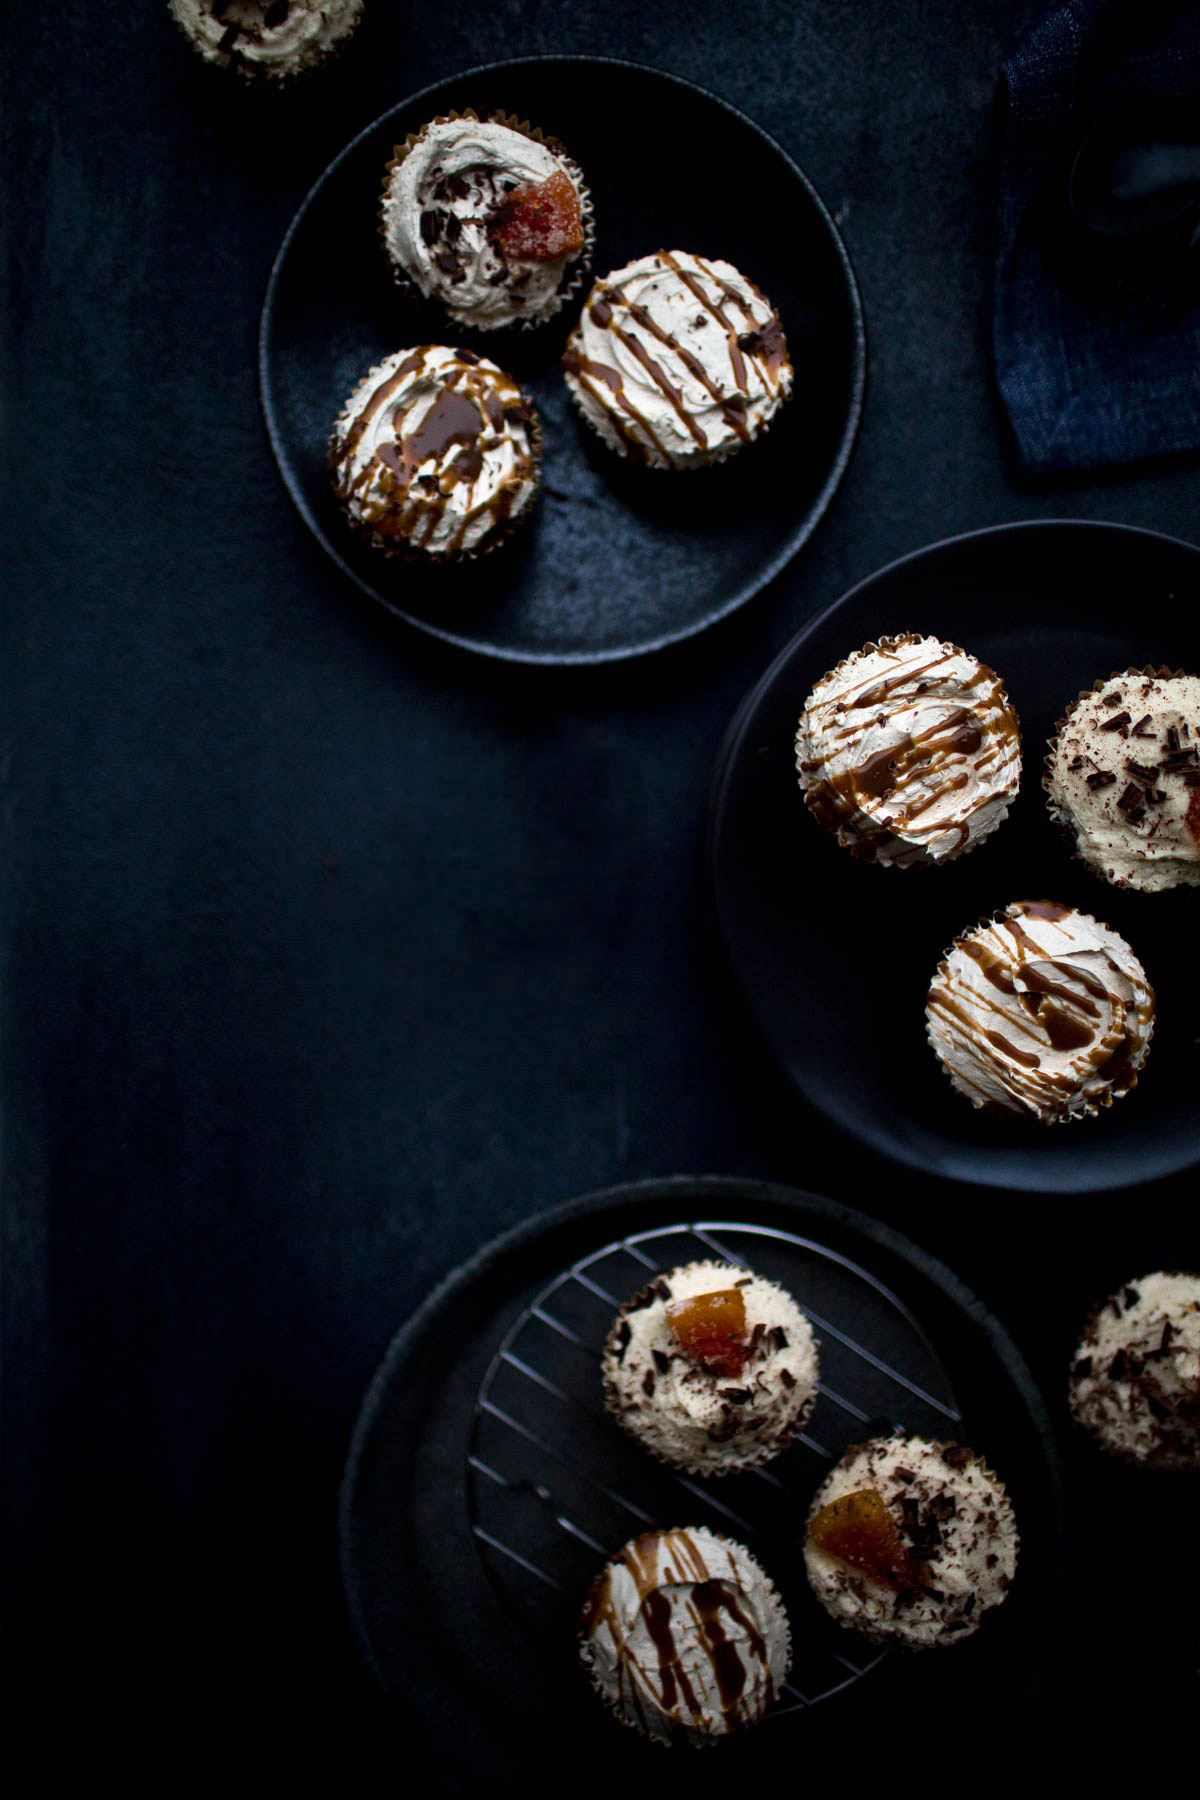 Vegan Chocolate Grapefruit and Dulce de Leche Cupcakes